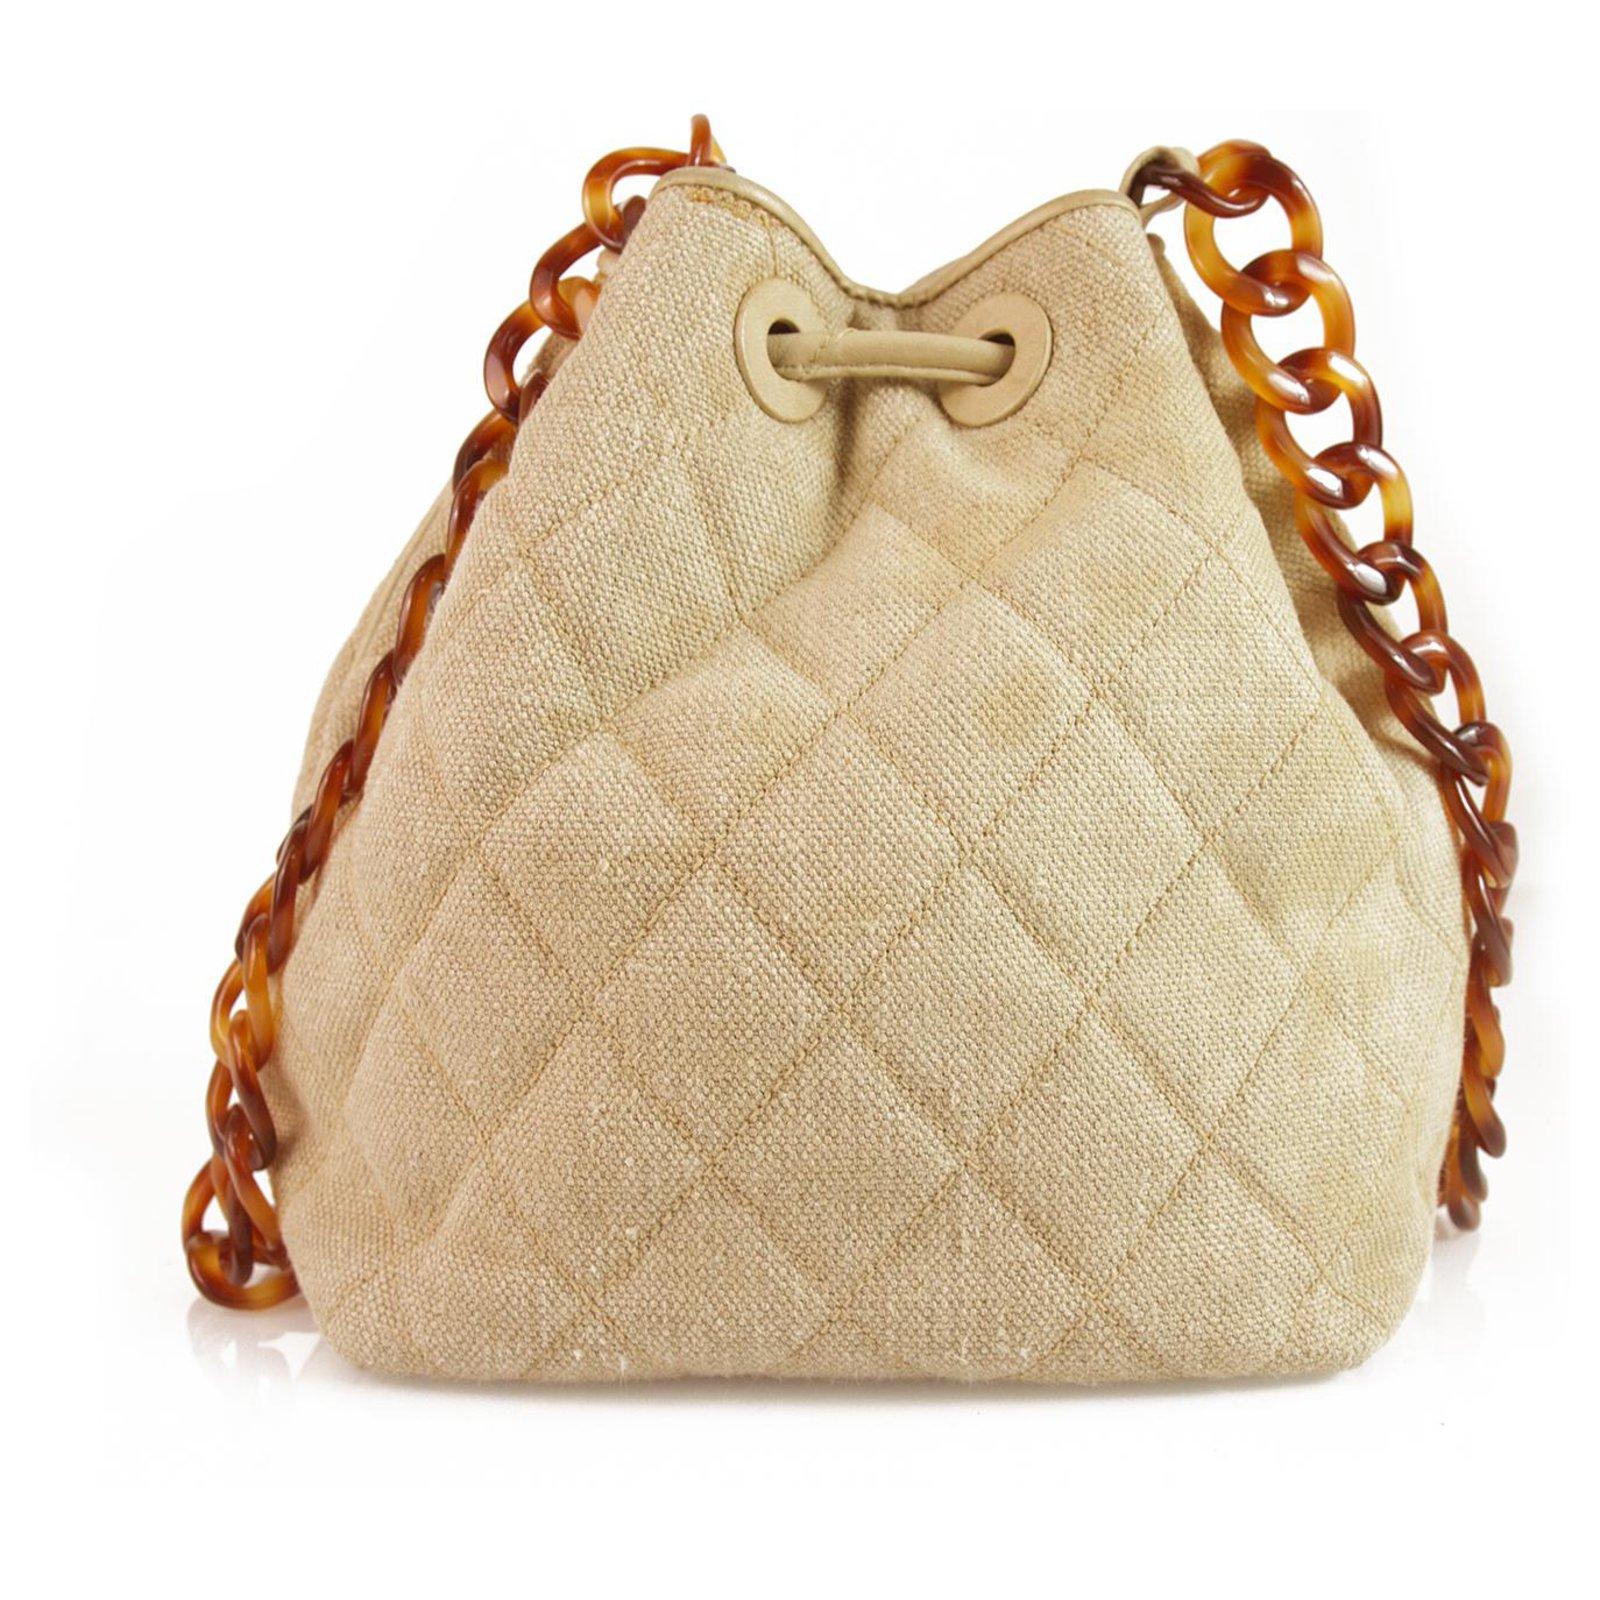 dd282af90 Chanel Chanel Vintage Beige Linen & Leather Drawstring Crossbody Bag w. Tortoise  chain Handbags Linen Beige ref.123418 - Joli Closet